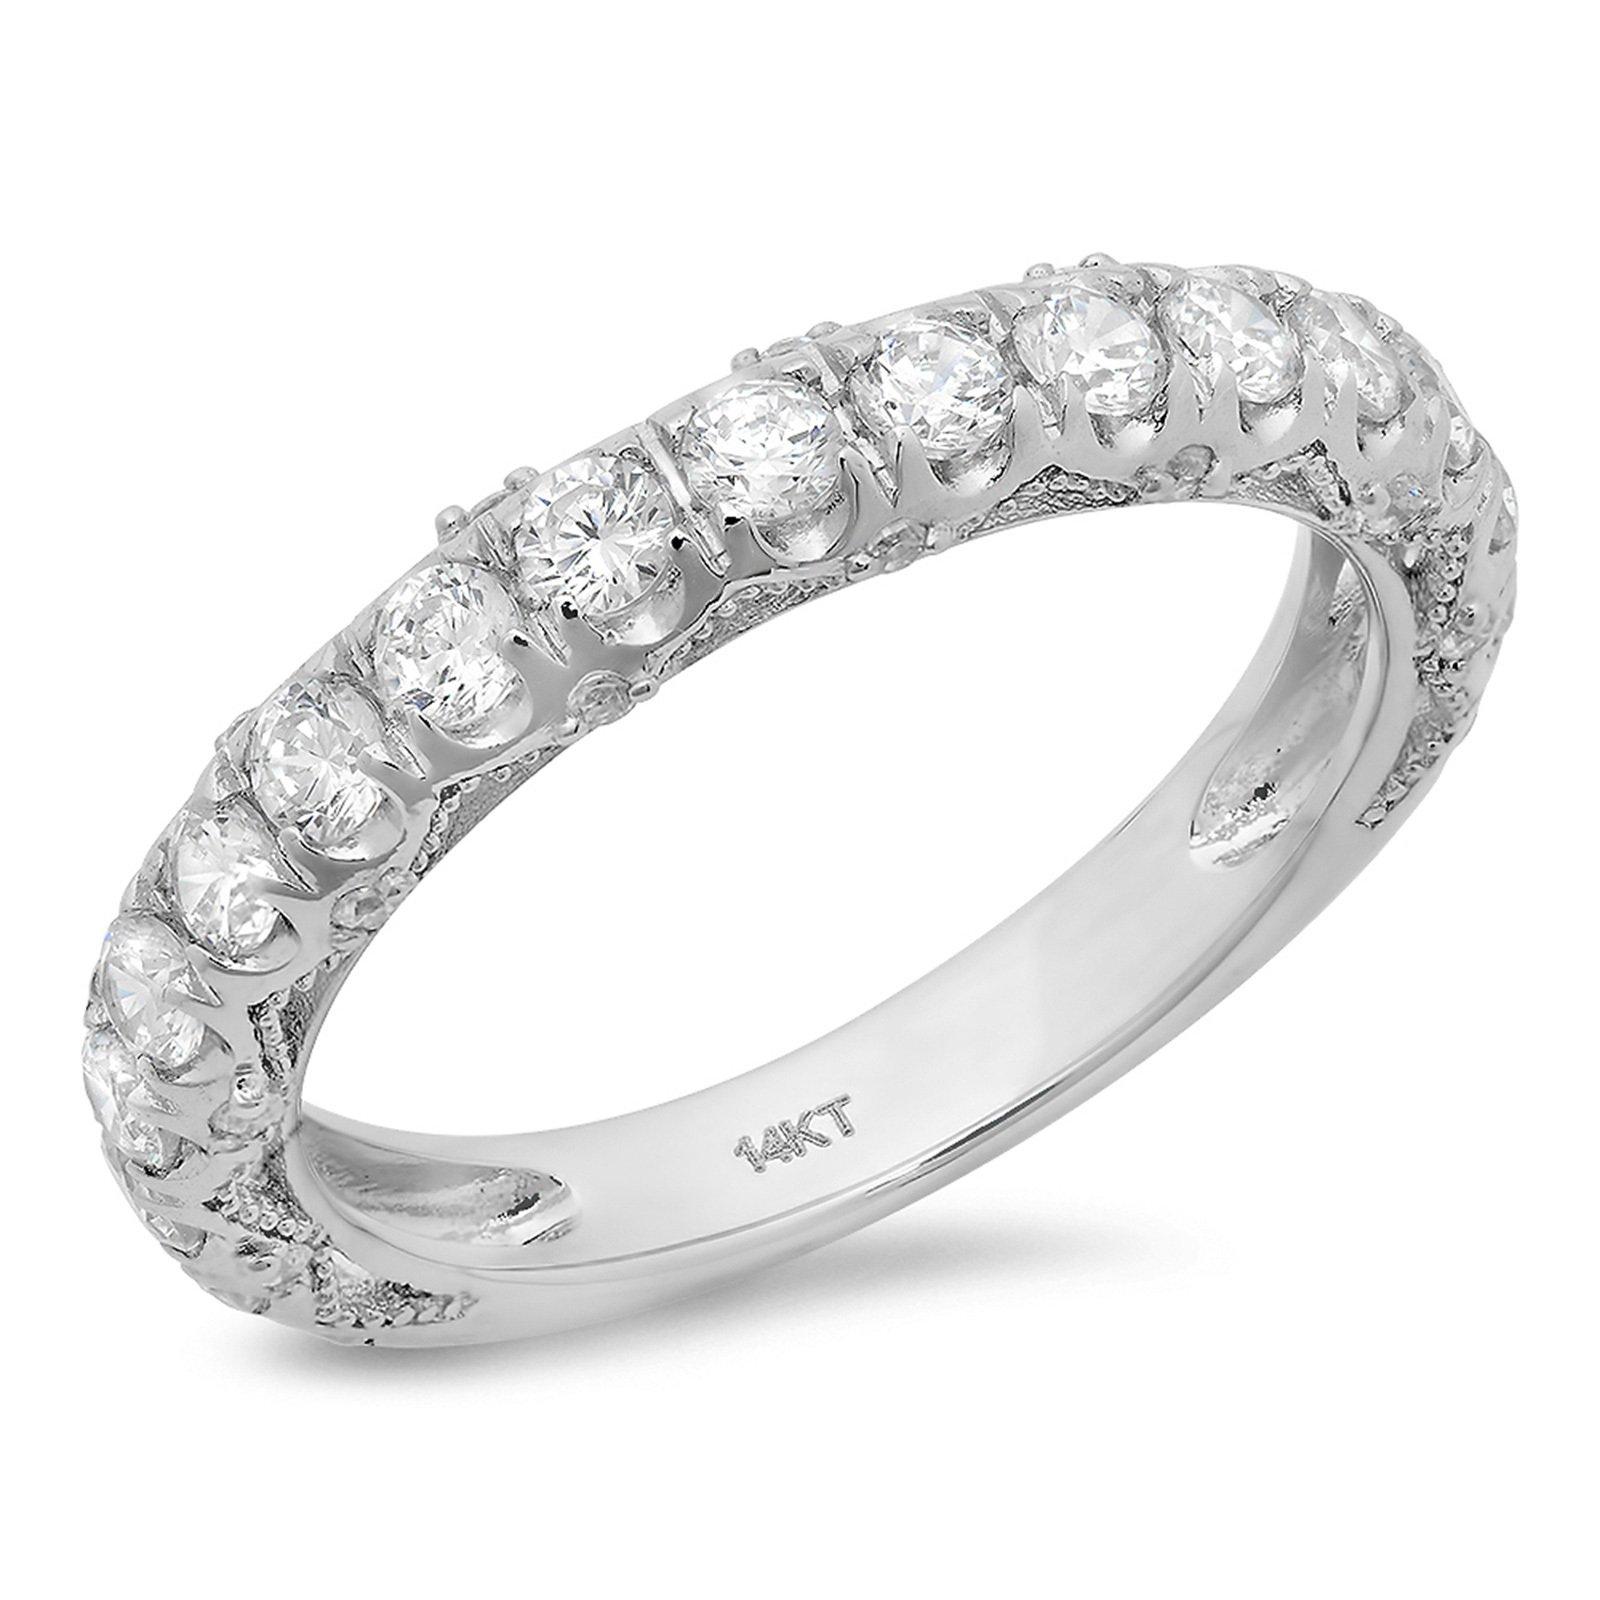 Clara Pucci 3.1 CT Round Cut CZ Pave Set Bridal Wedding Engagement Band Ring 14k White Gold, Size 8